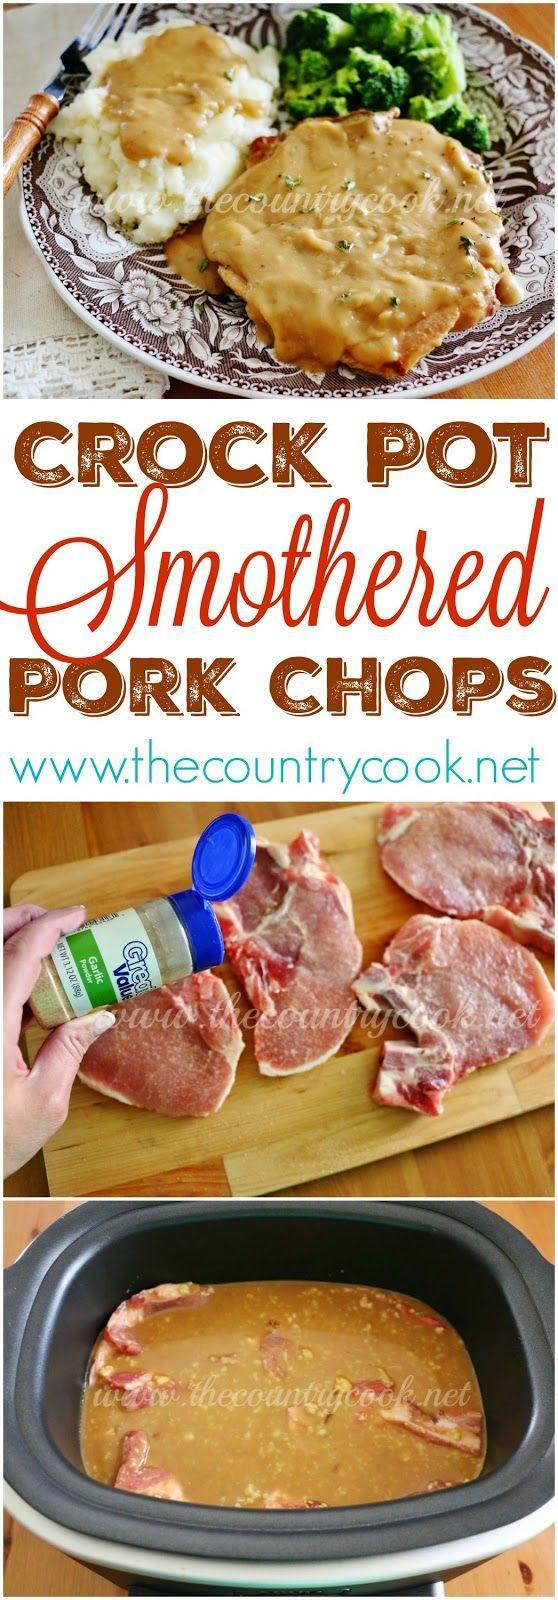 Healthy Crock Pot Pork Chops  17 images about crockpot reciepes on Pinterest